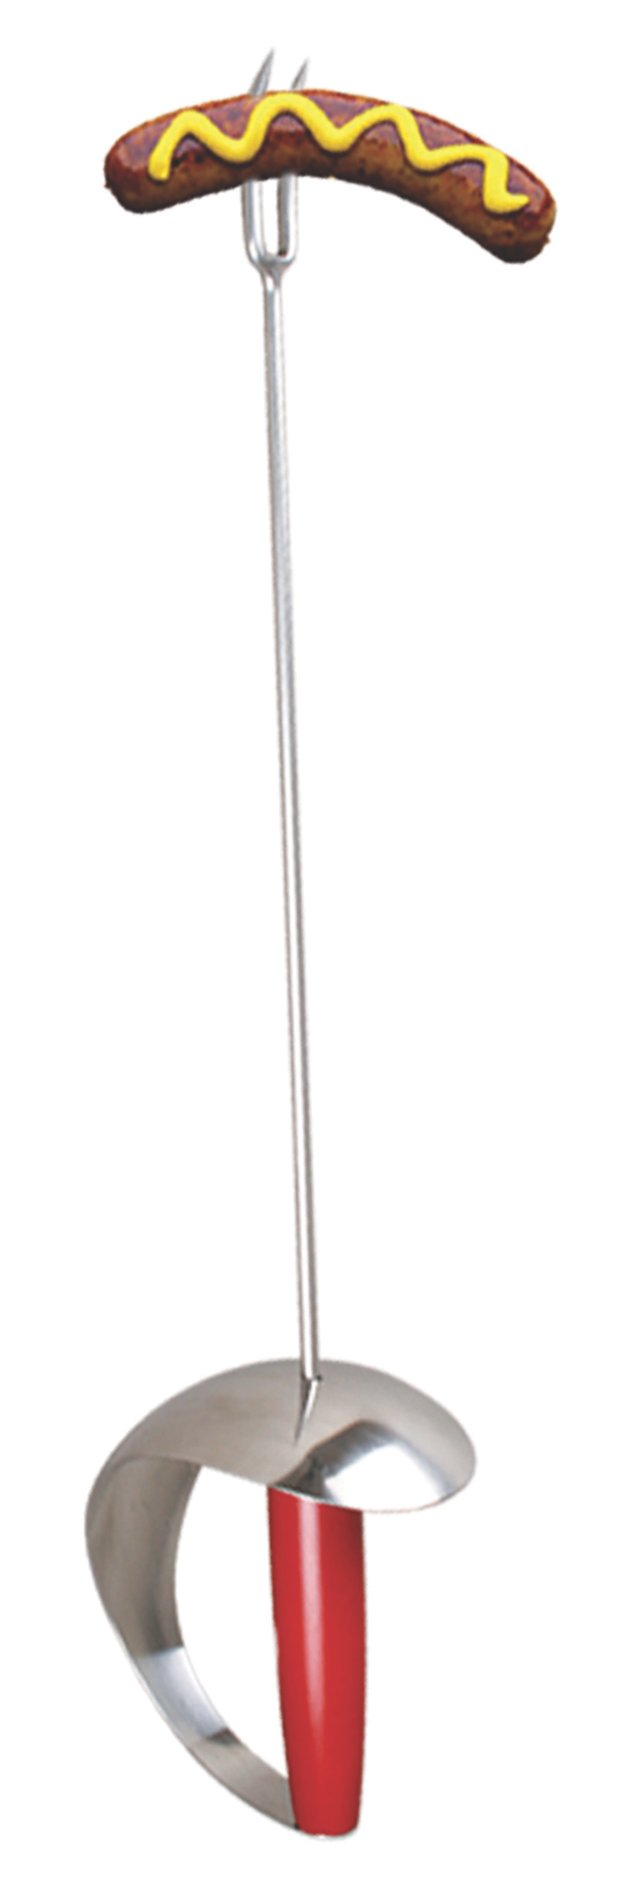 BBQ Sword Cooking Tool